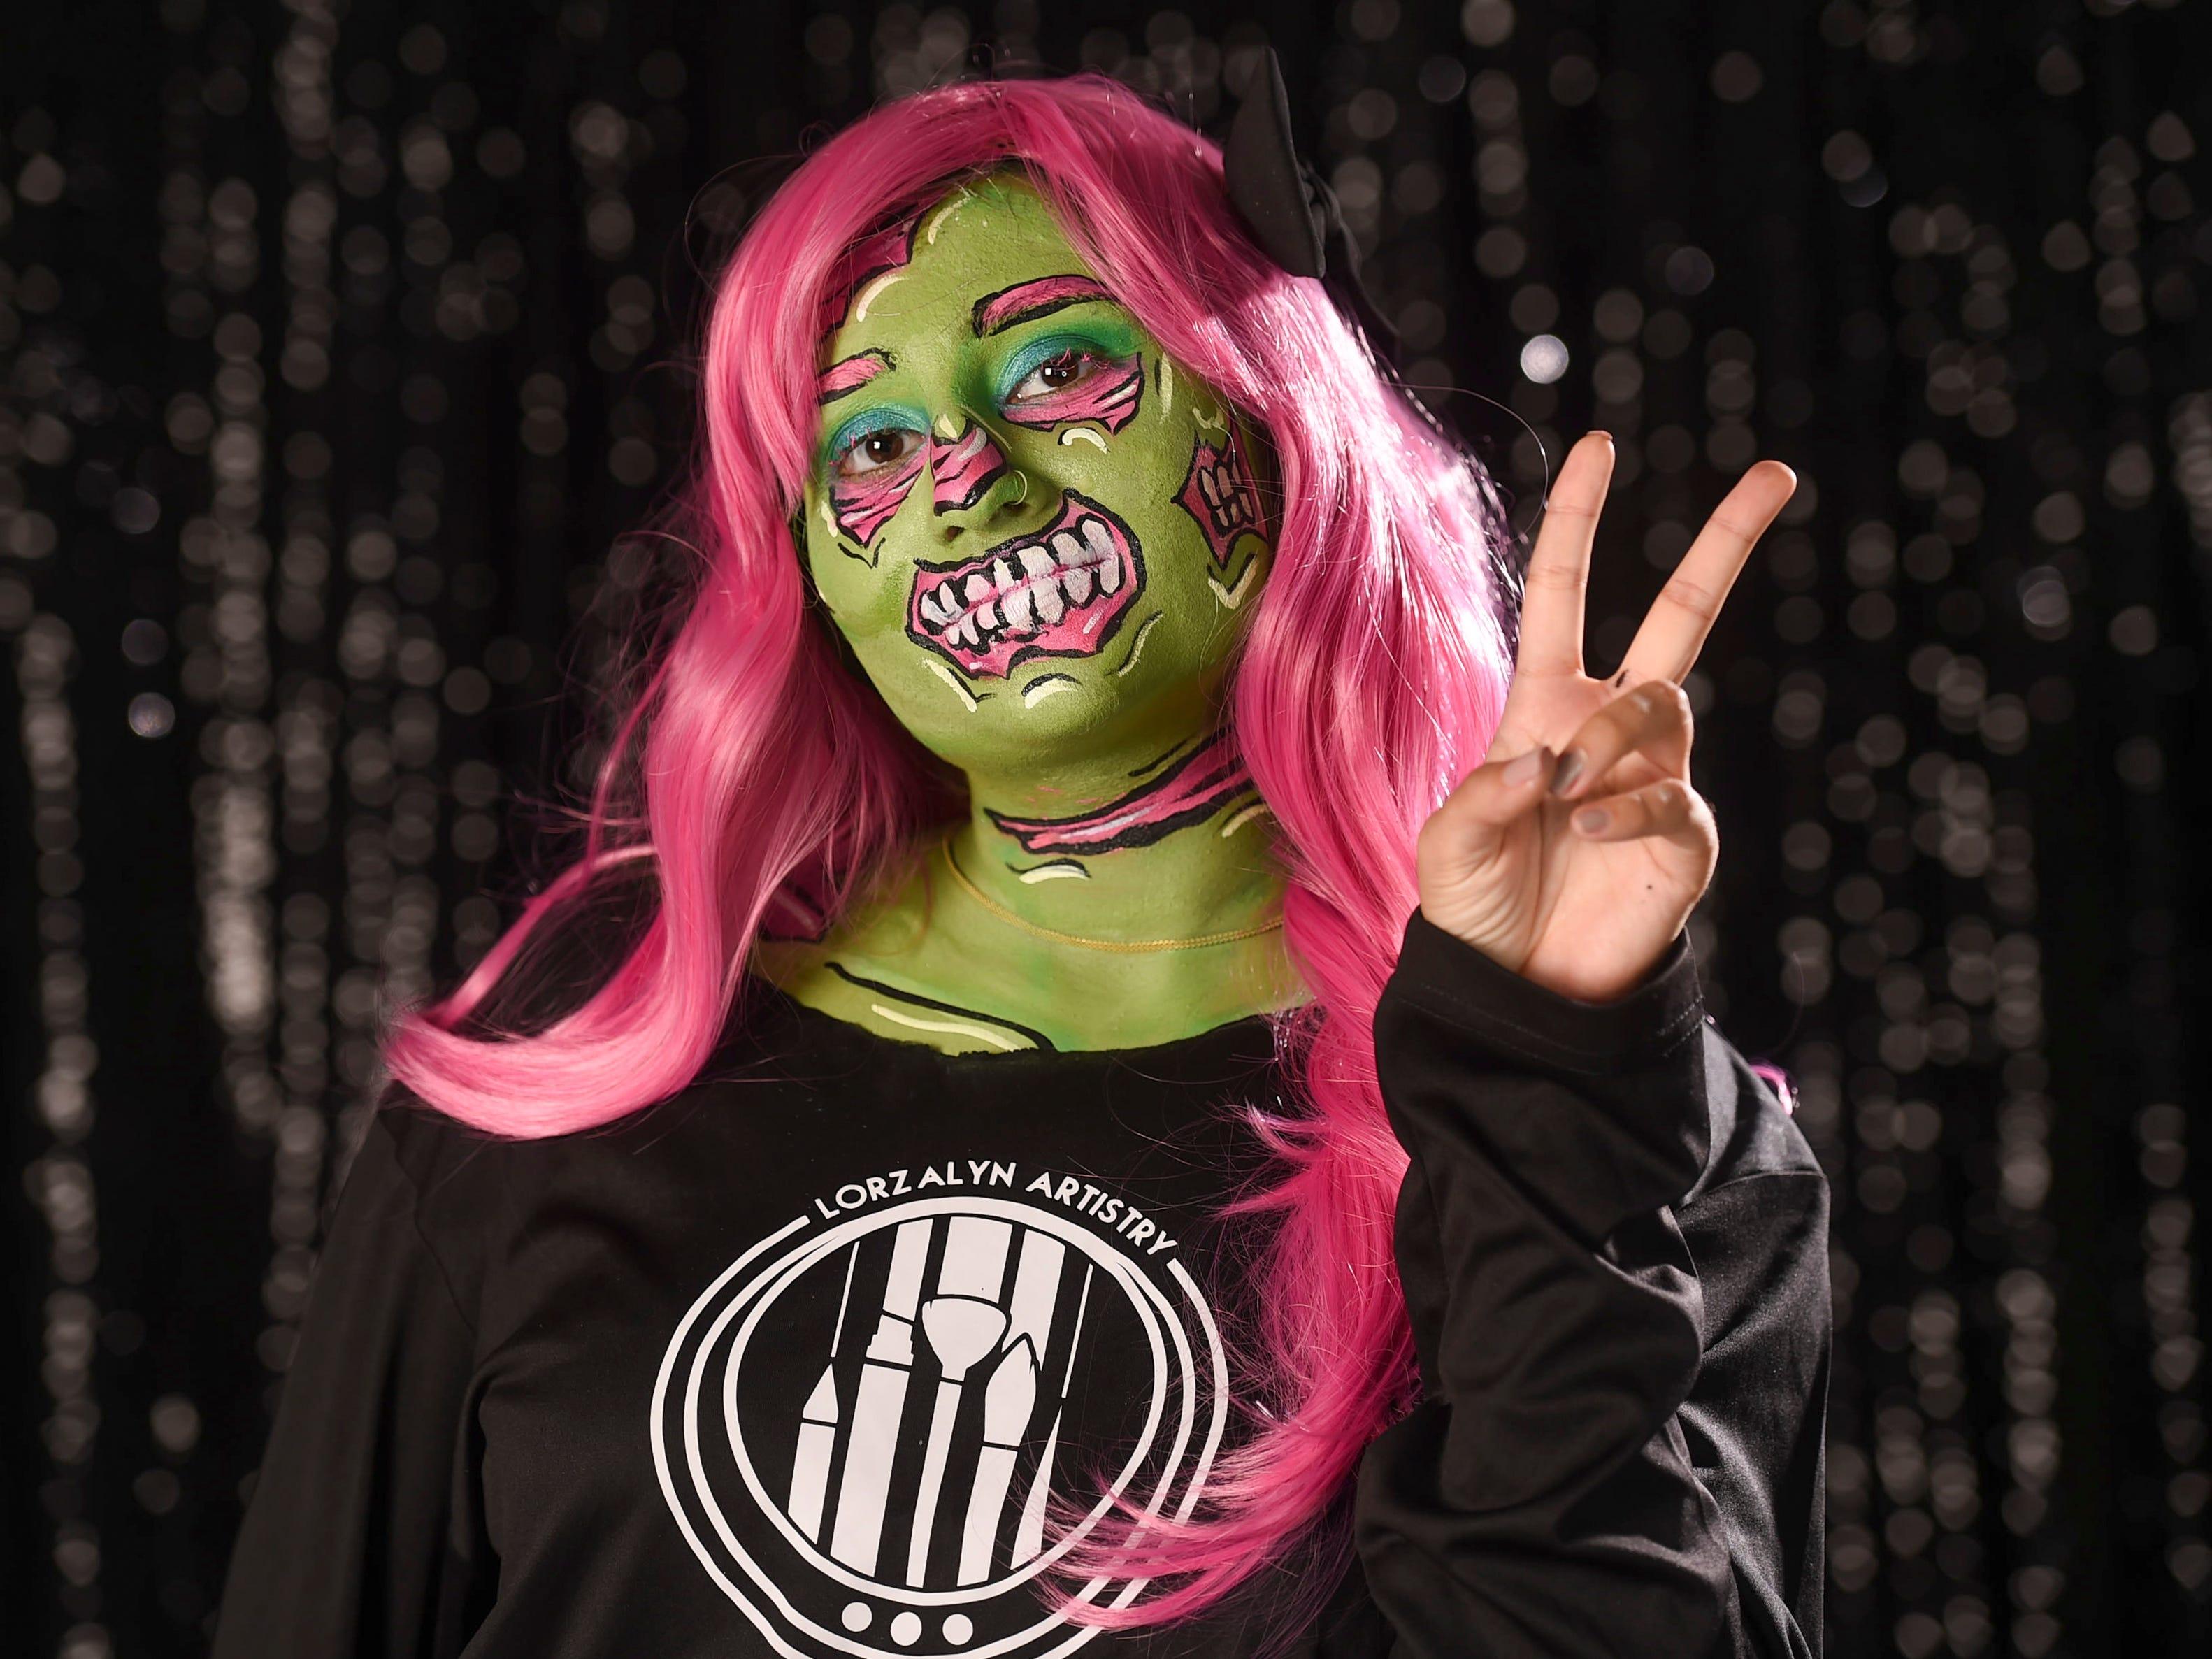 Pacific Daily News reporter Anumita Kaur as a pop art zombie, Oct. 9, 2018.